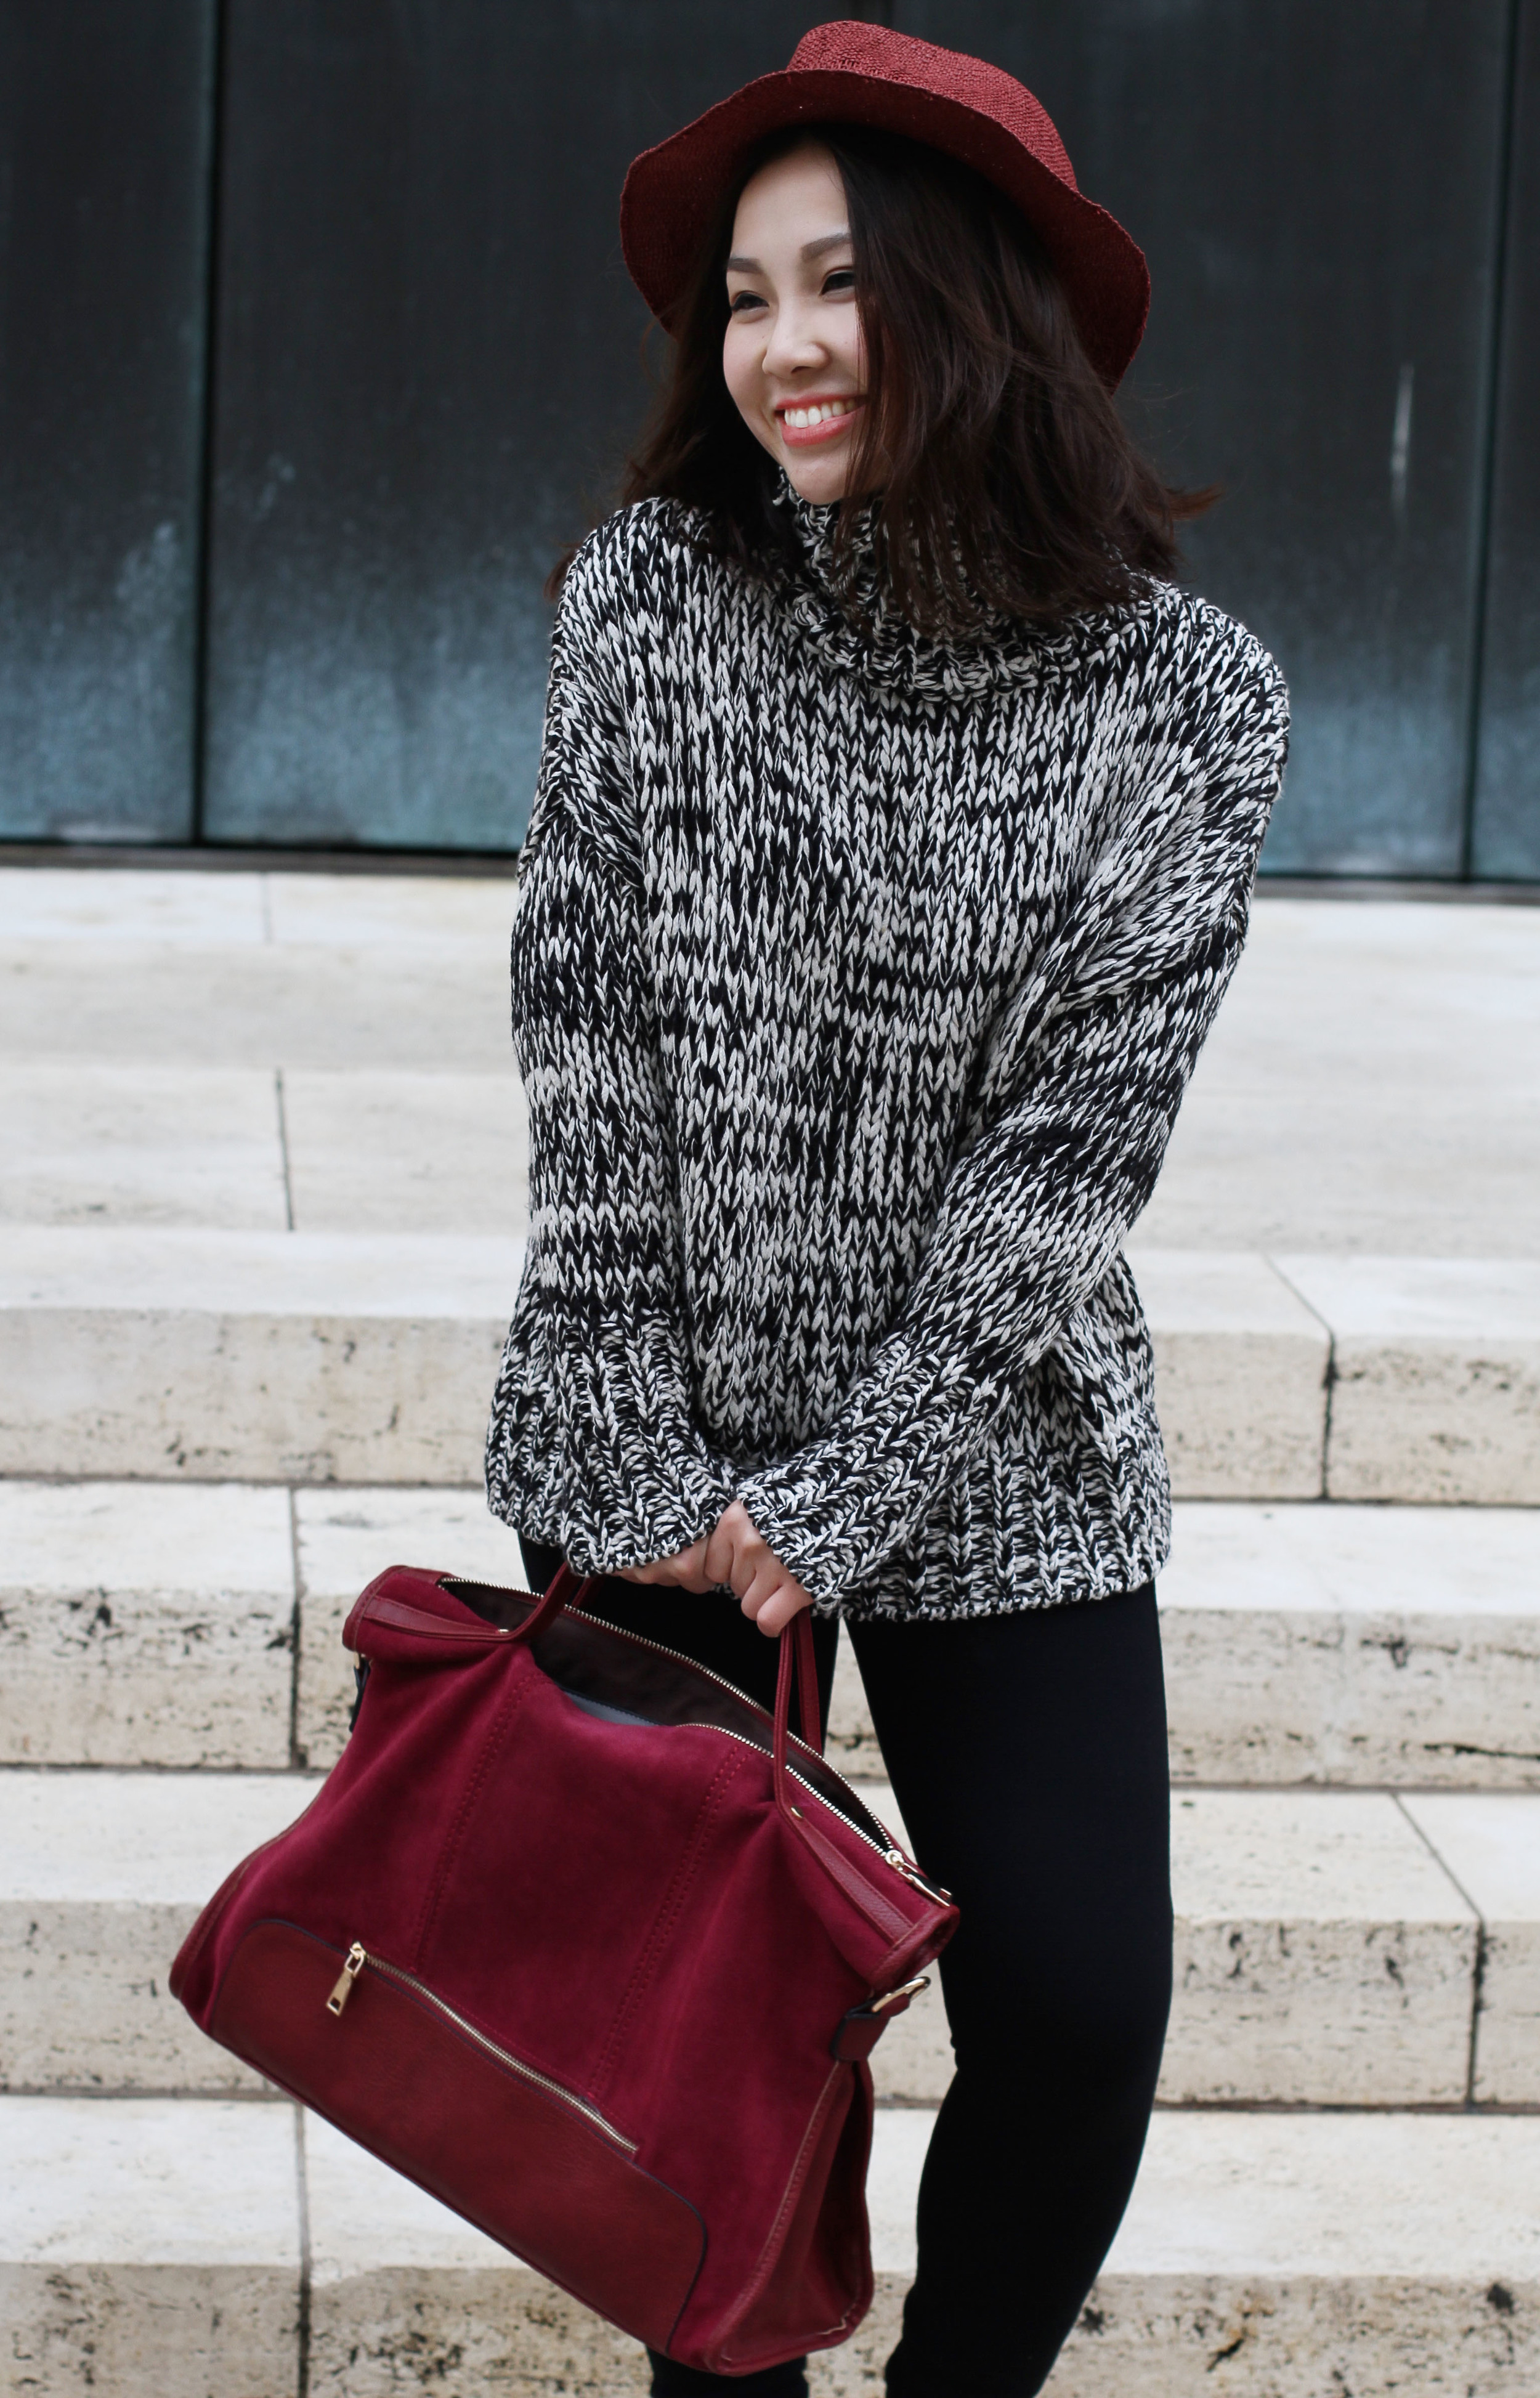 petite style blogger.jpg